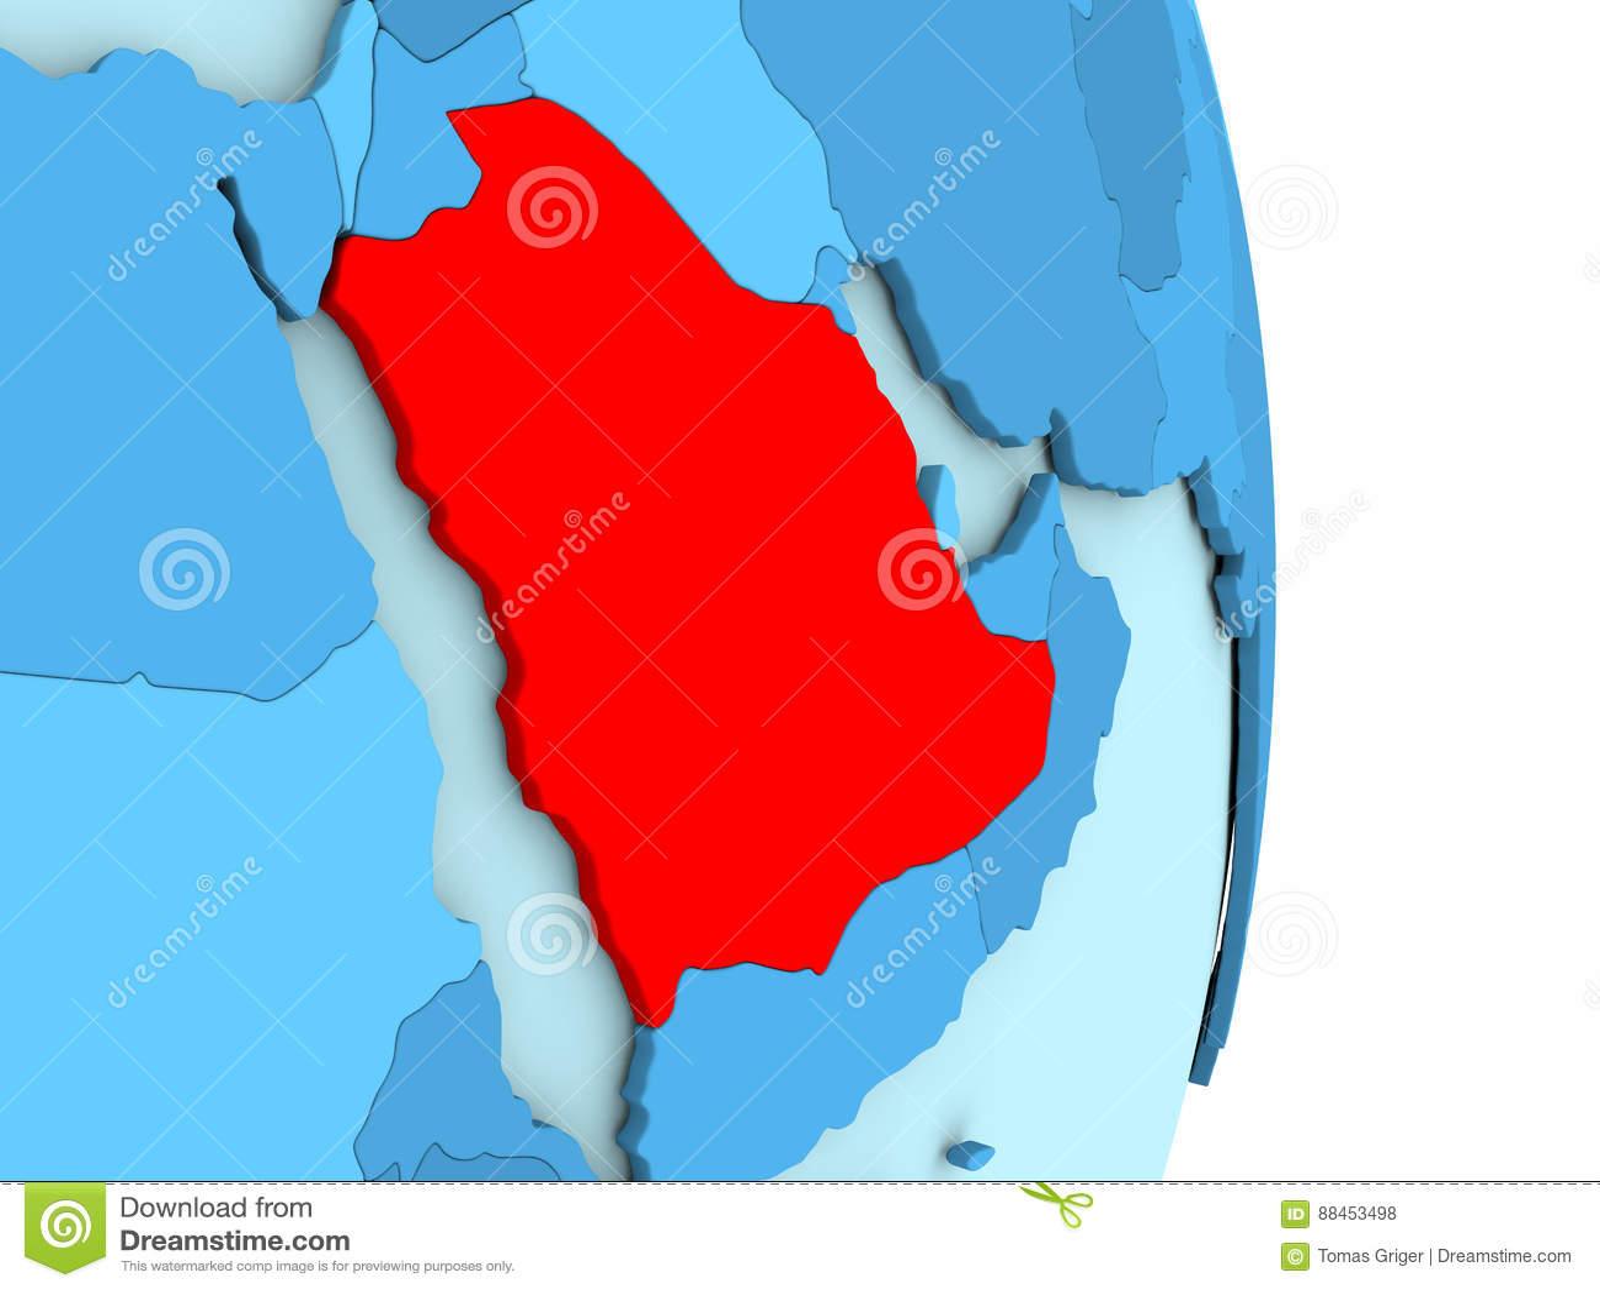 Saudi Arabia On Blue Political Globe Stock Illustration ...